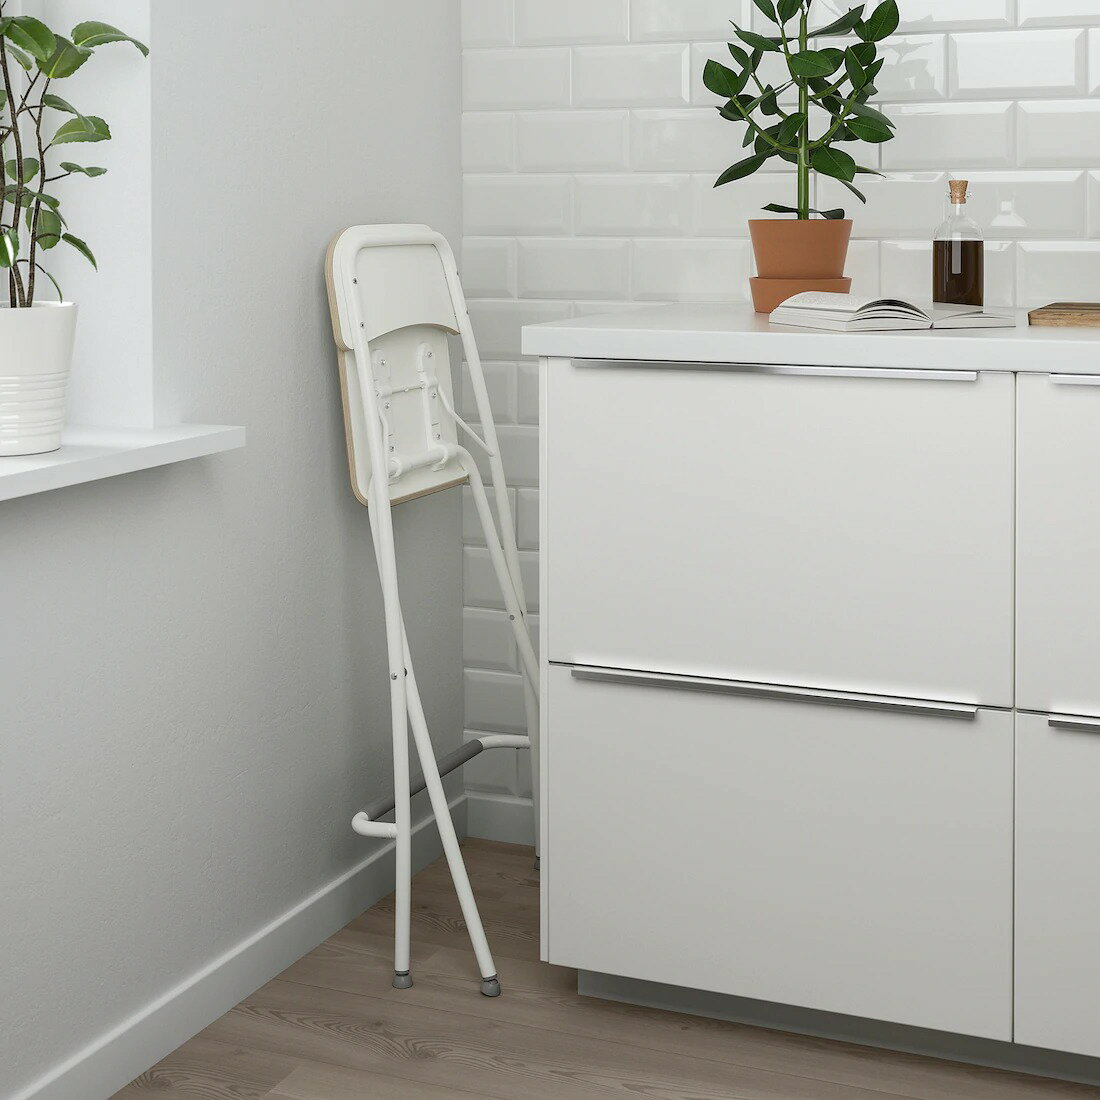 【IKEAOriginal】FRANKLIN-フランクリン-バースツール背もたれ付き折りたたみ式ホワイトホワイト63cm